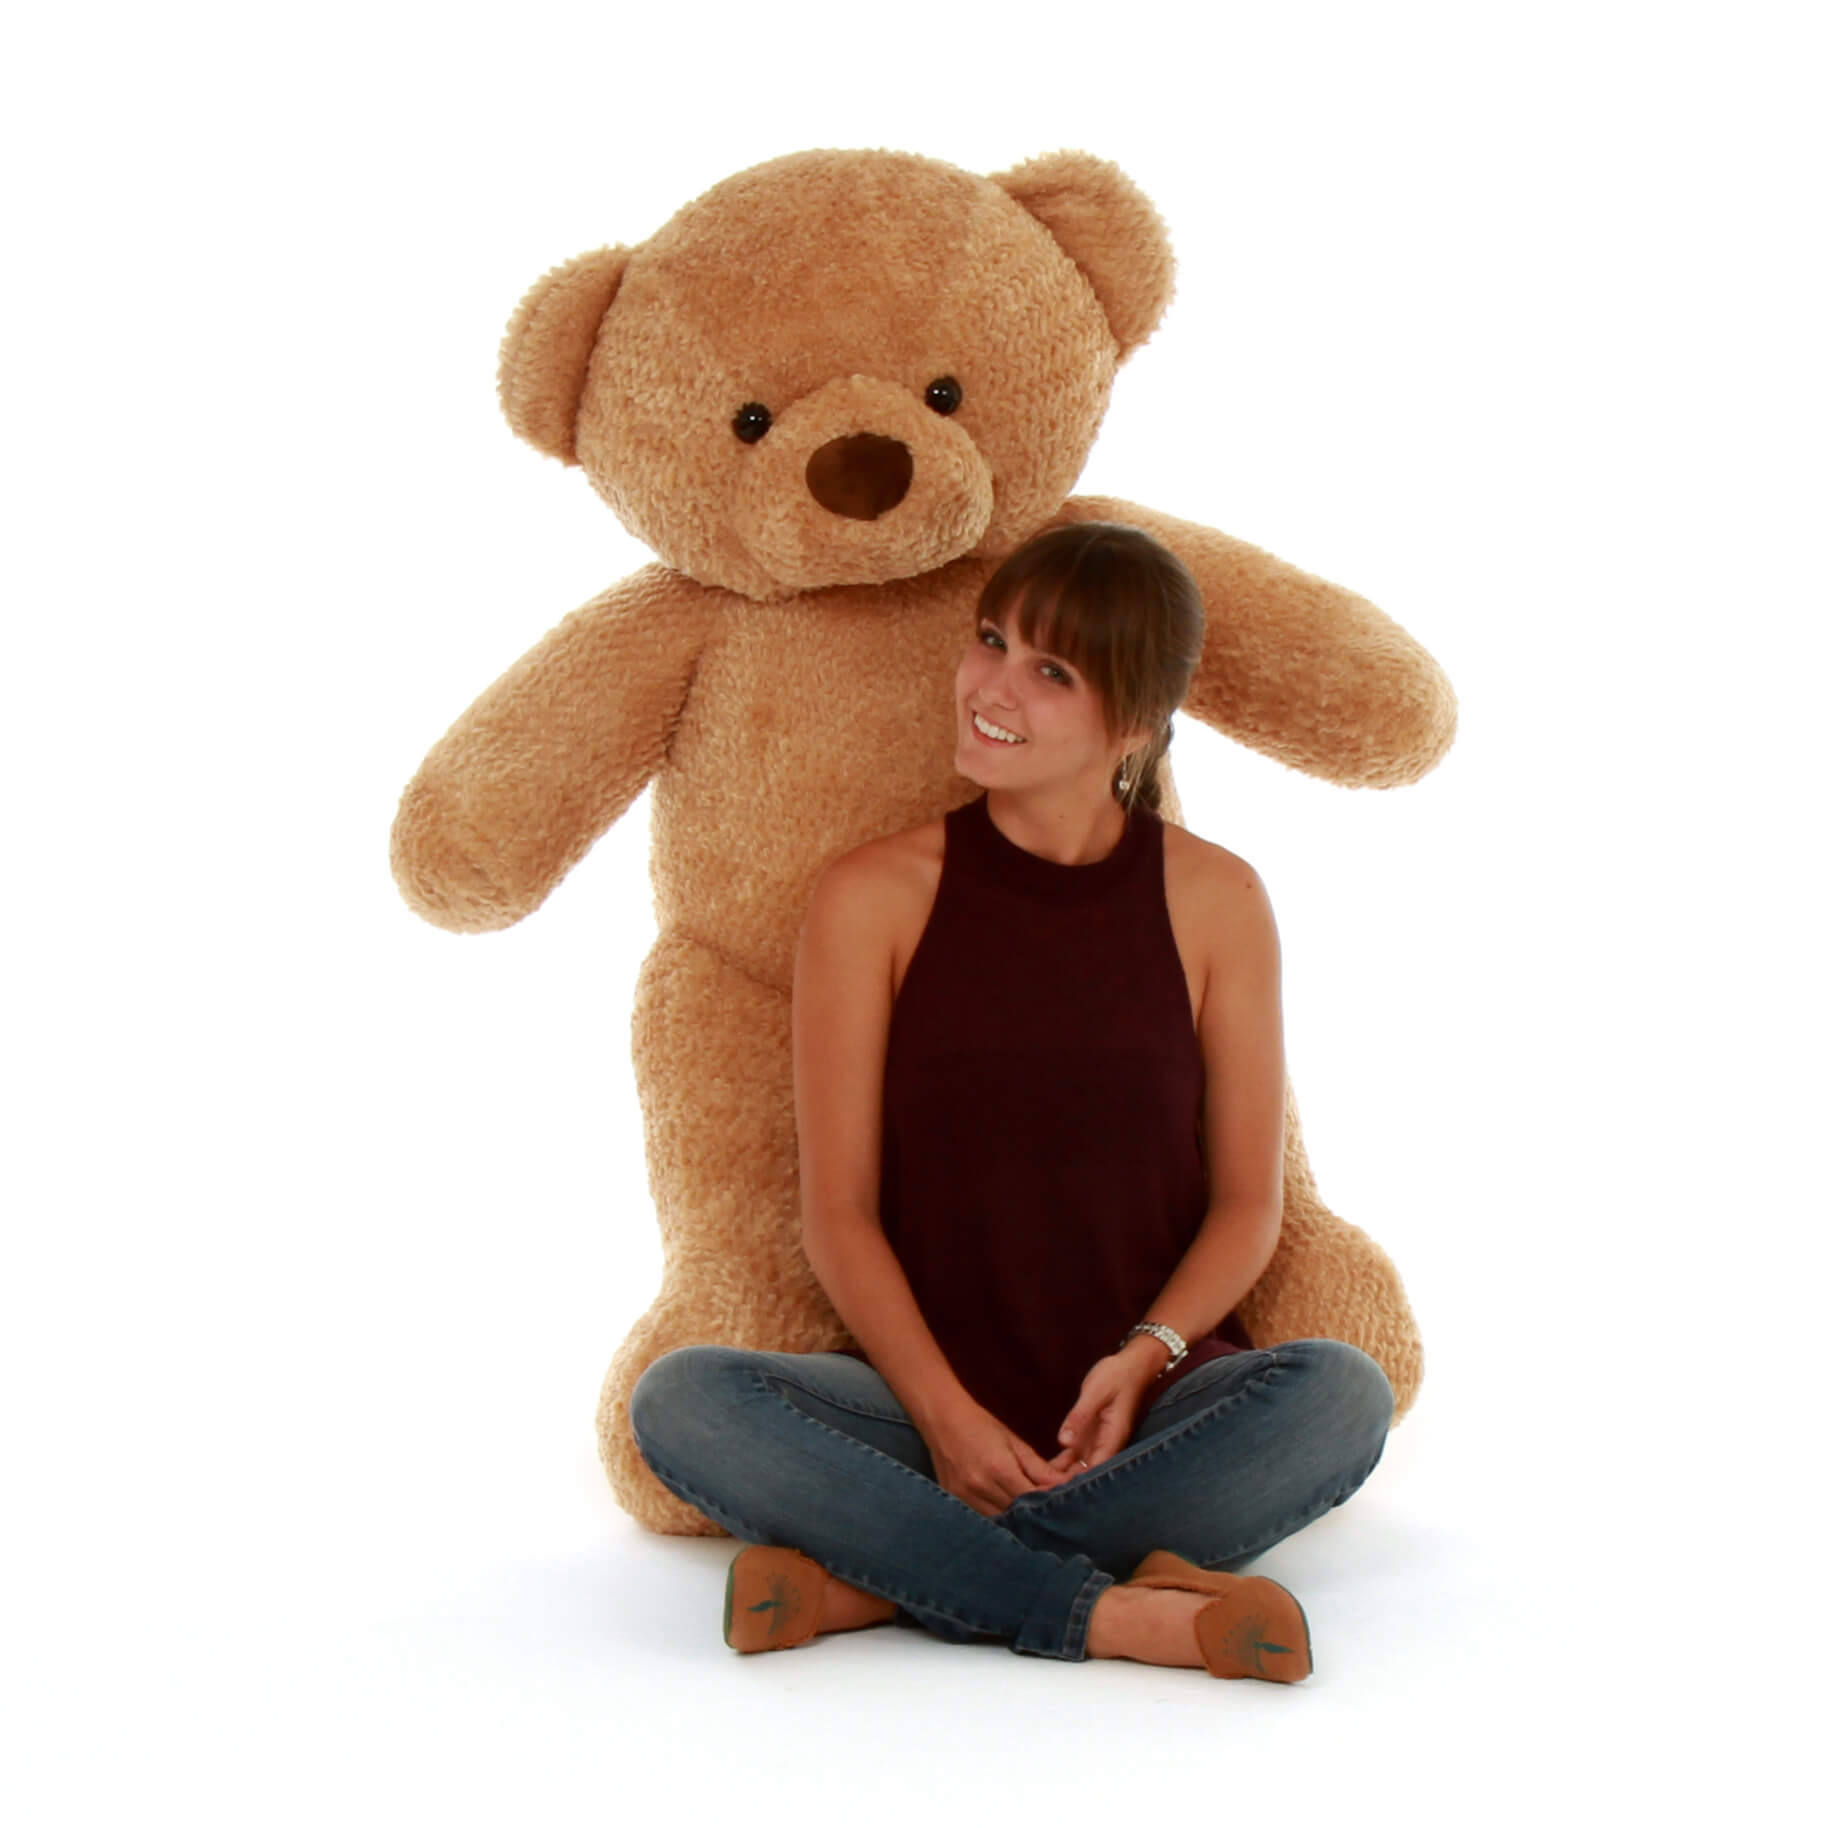 cutie-chubs-amber-brown-teddy-bear-48in-1.jpg